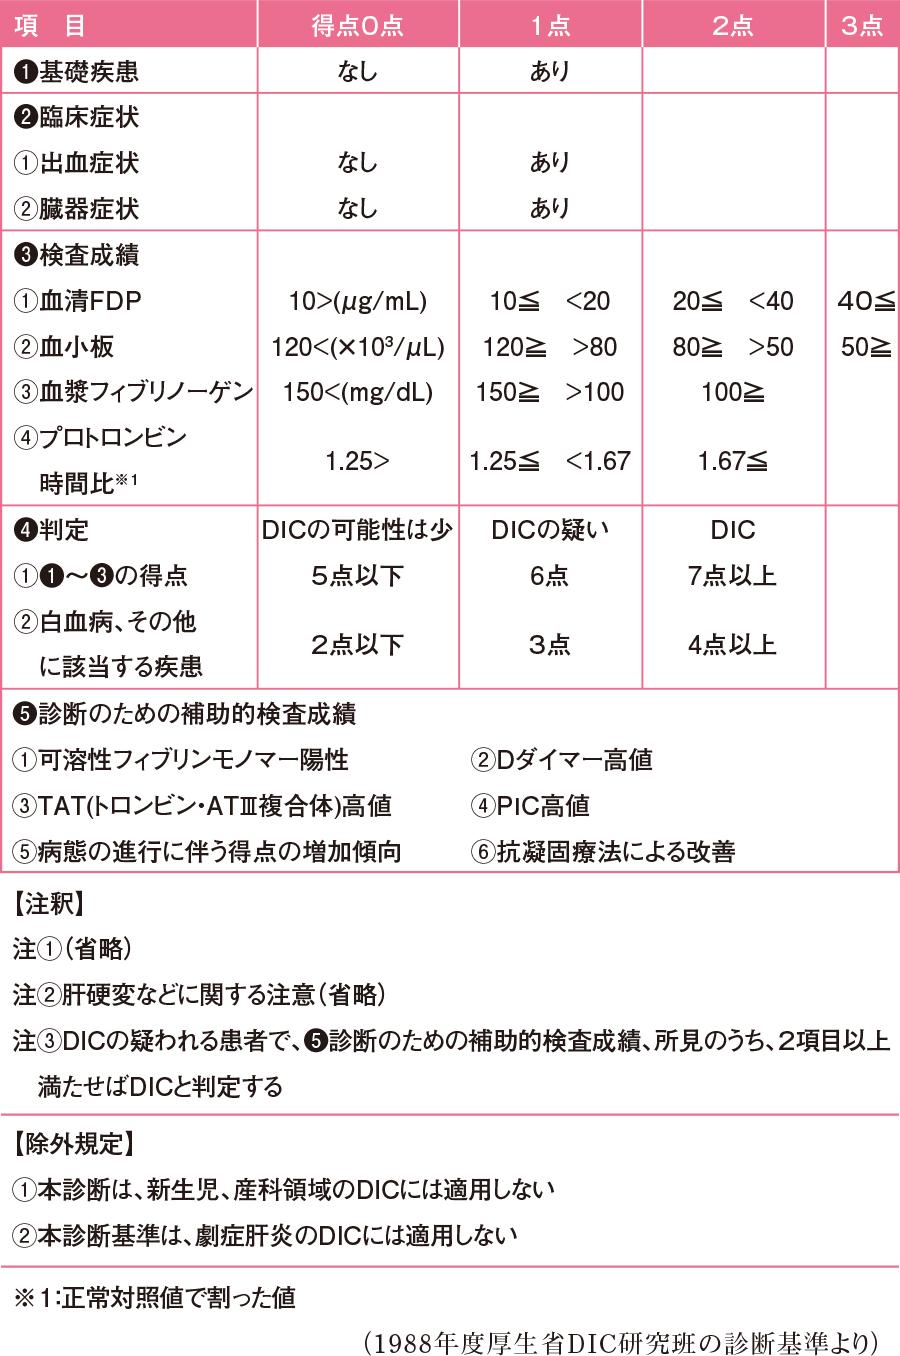 Dic 診断 基準 血液・呼吸器内科のお役立ち情報:厚生労働省DIC診断基準の改訂へ(1...